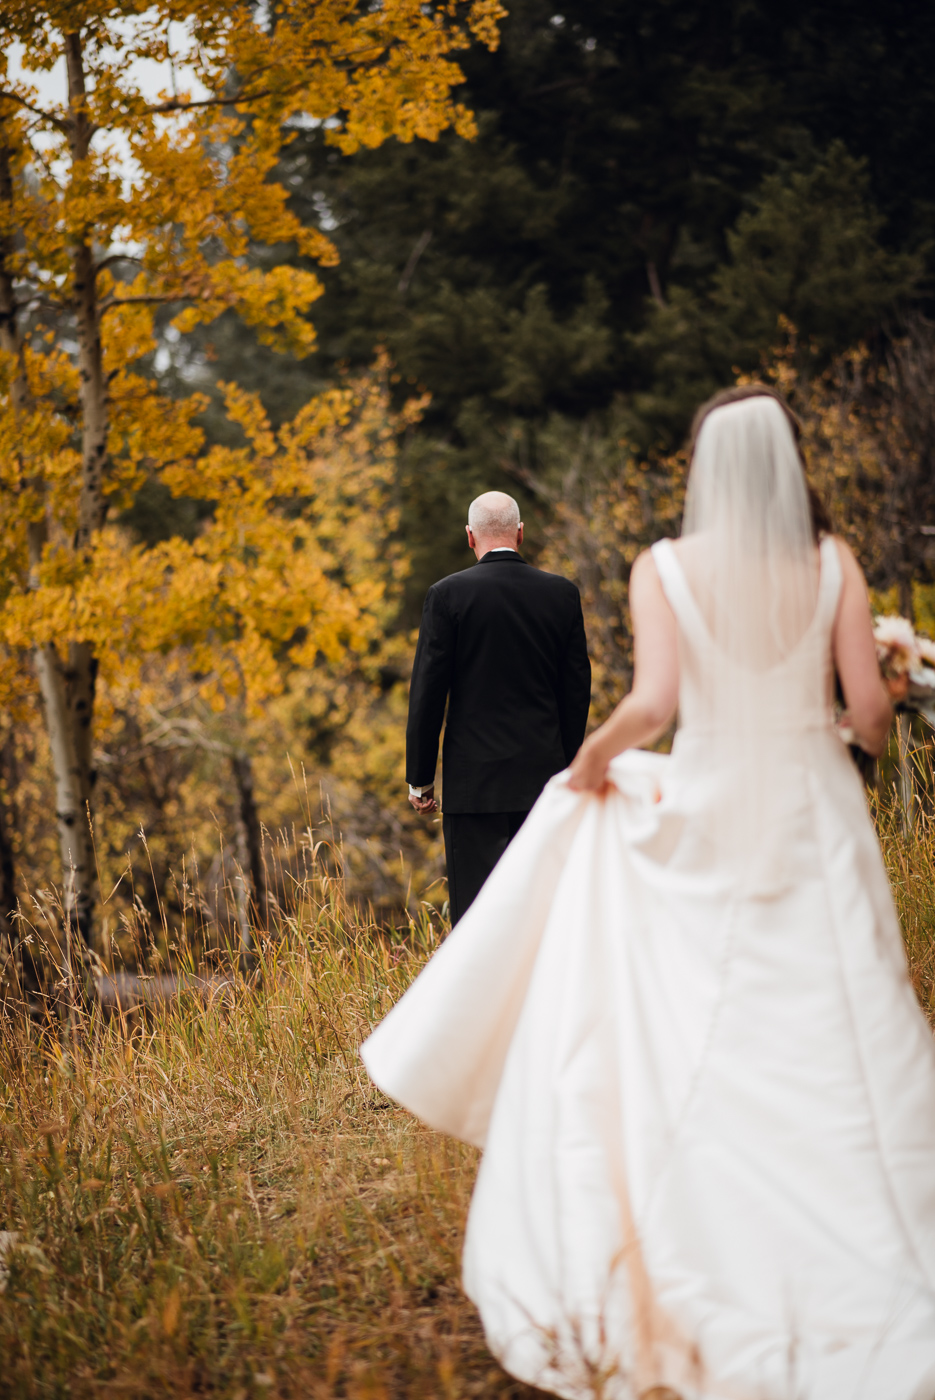 Candice Rawlin Wedding PHOCO Photography Pines Genesee Golden Colorado Fog -17.jpg